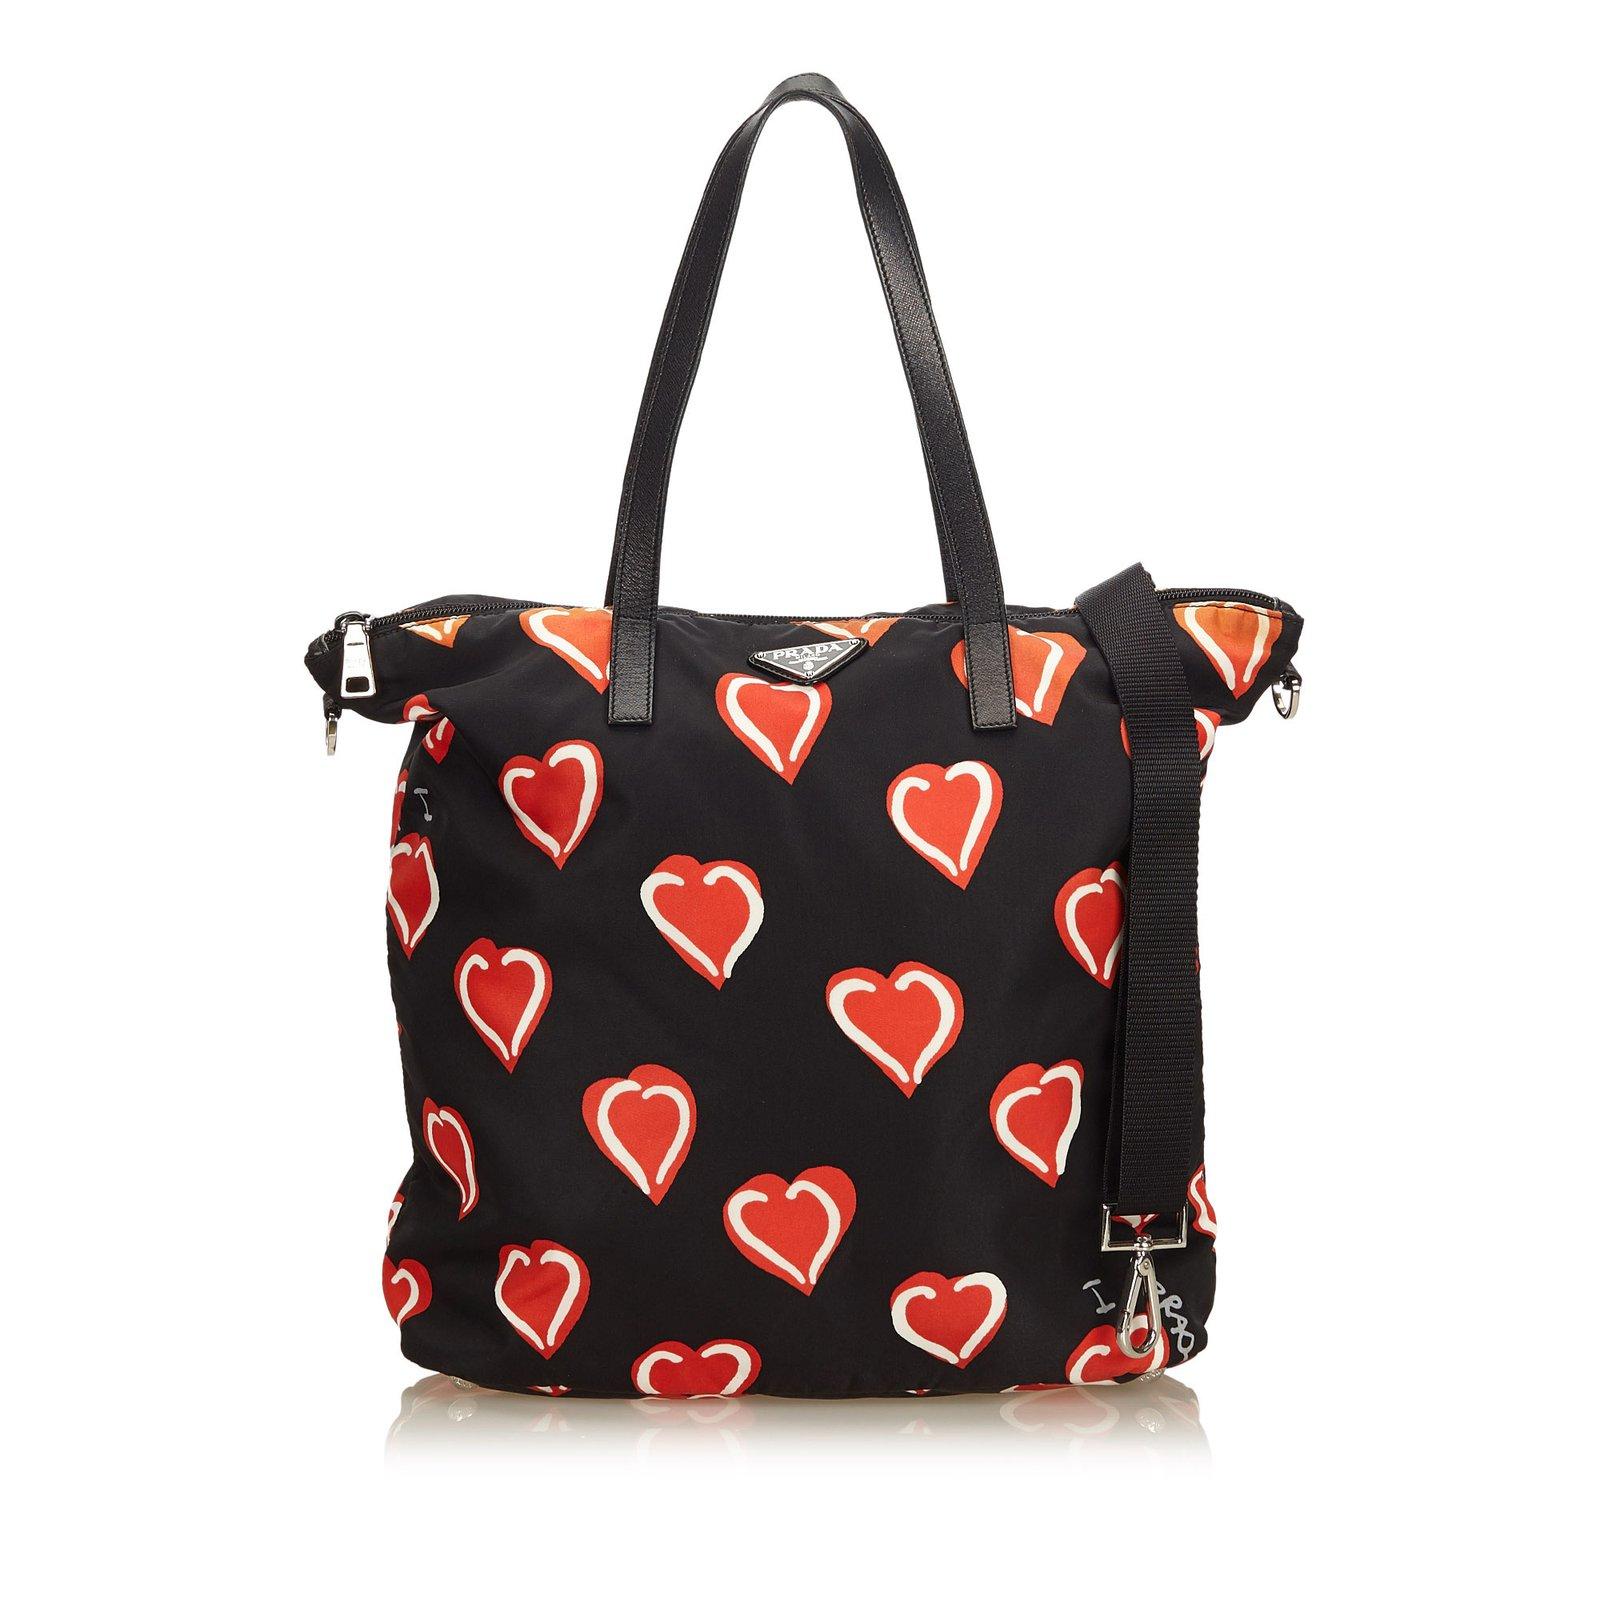 15613f74a1b4 ... shopping prada heart printed nylon satchel handbags  leatherothernyloncloth black 66e50 643bf